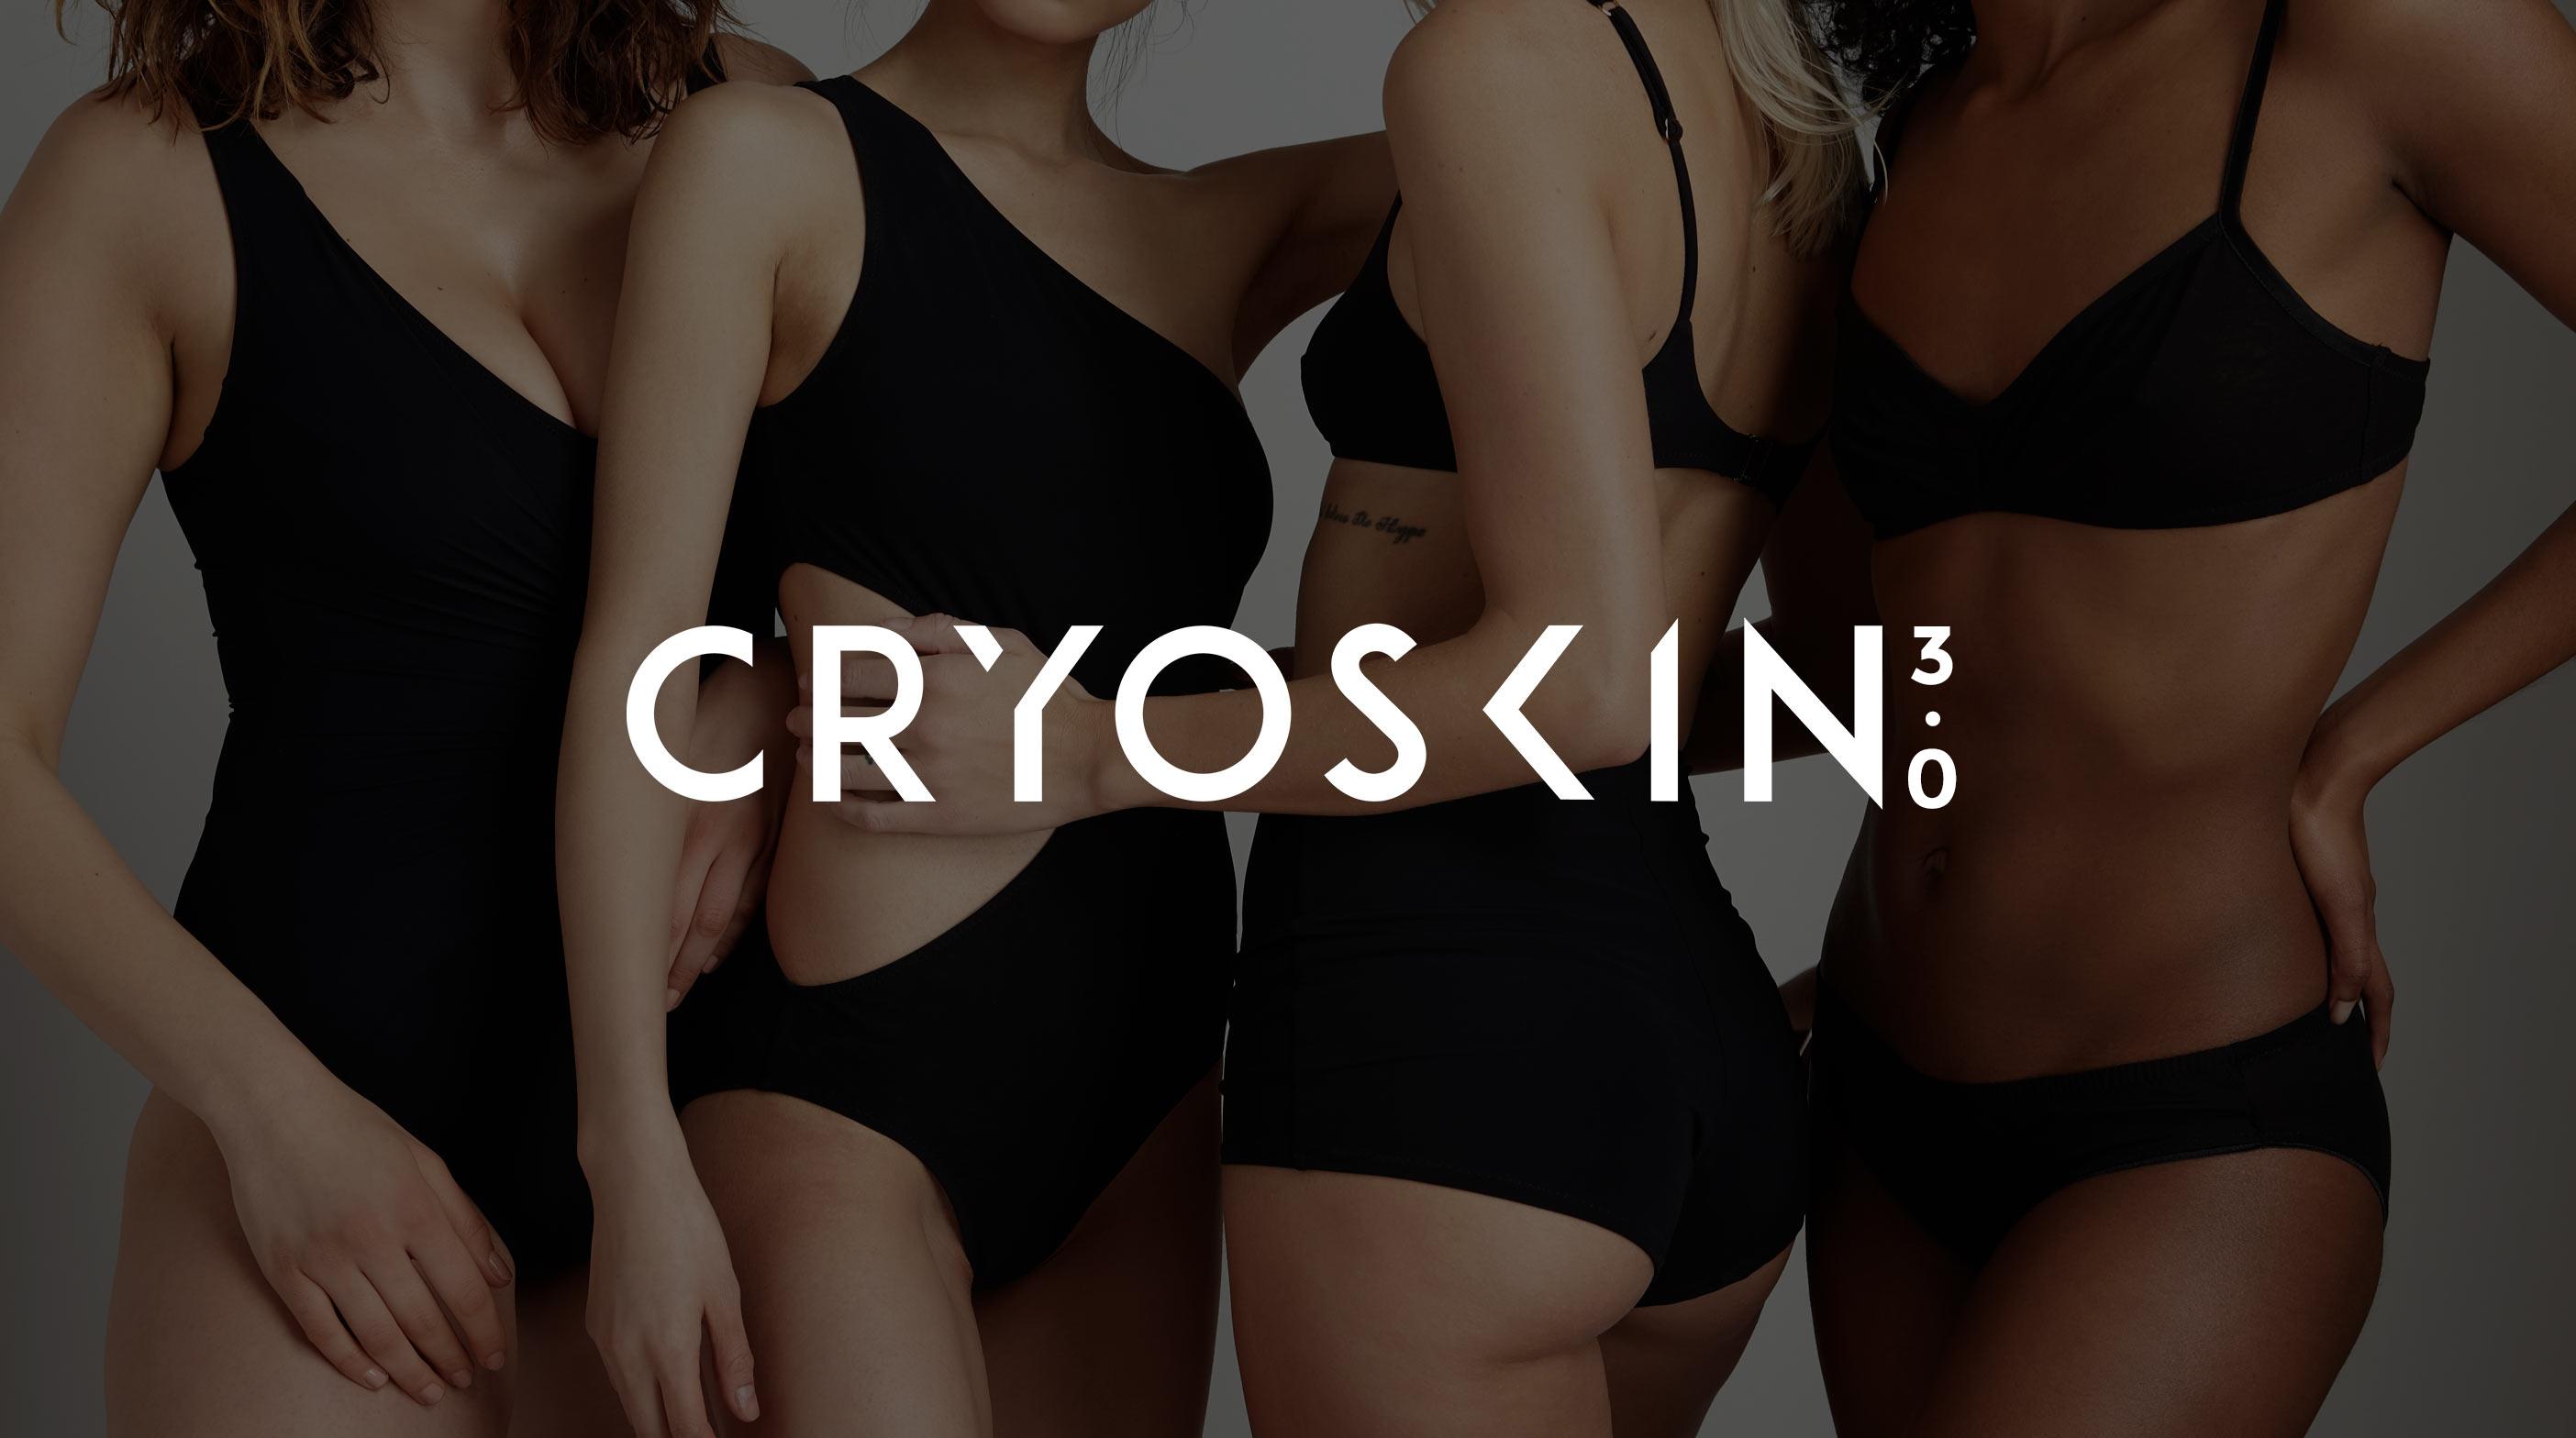 cryoskin-image3.0.jpg